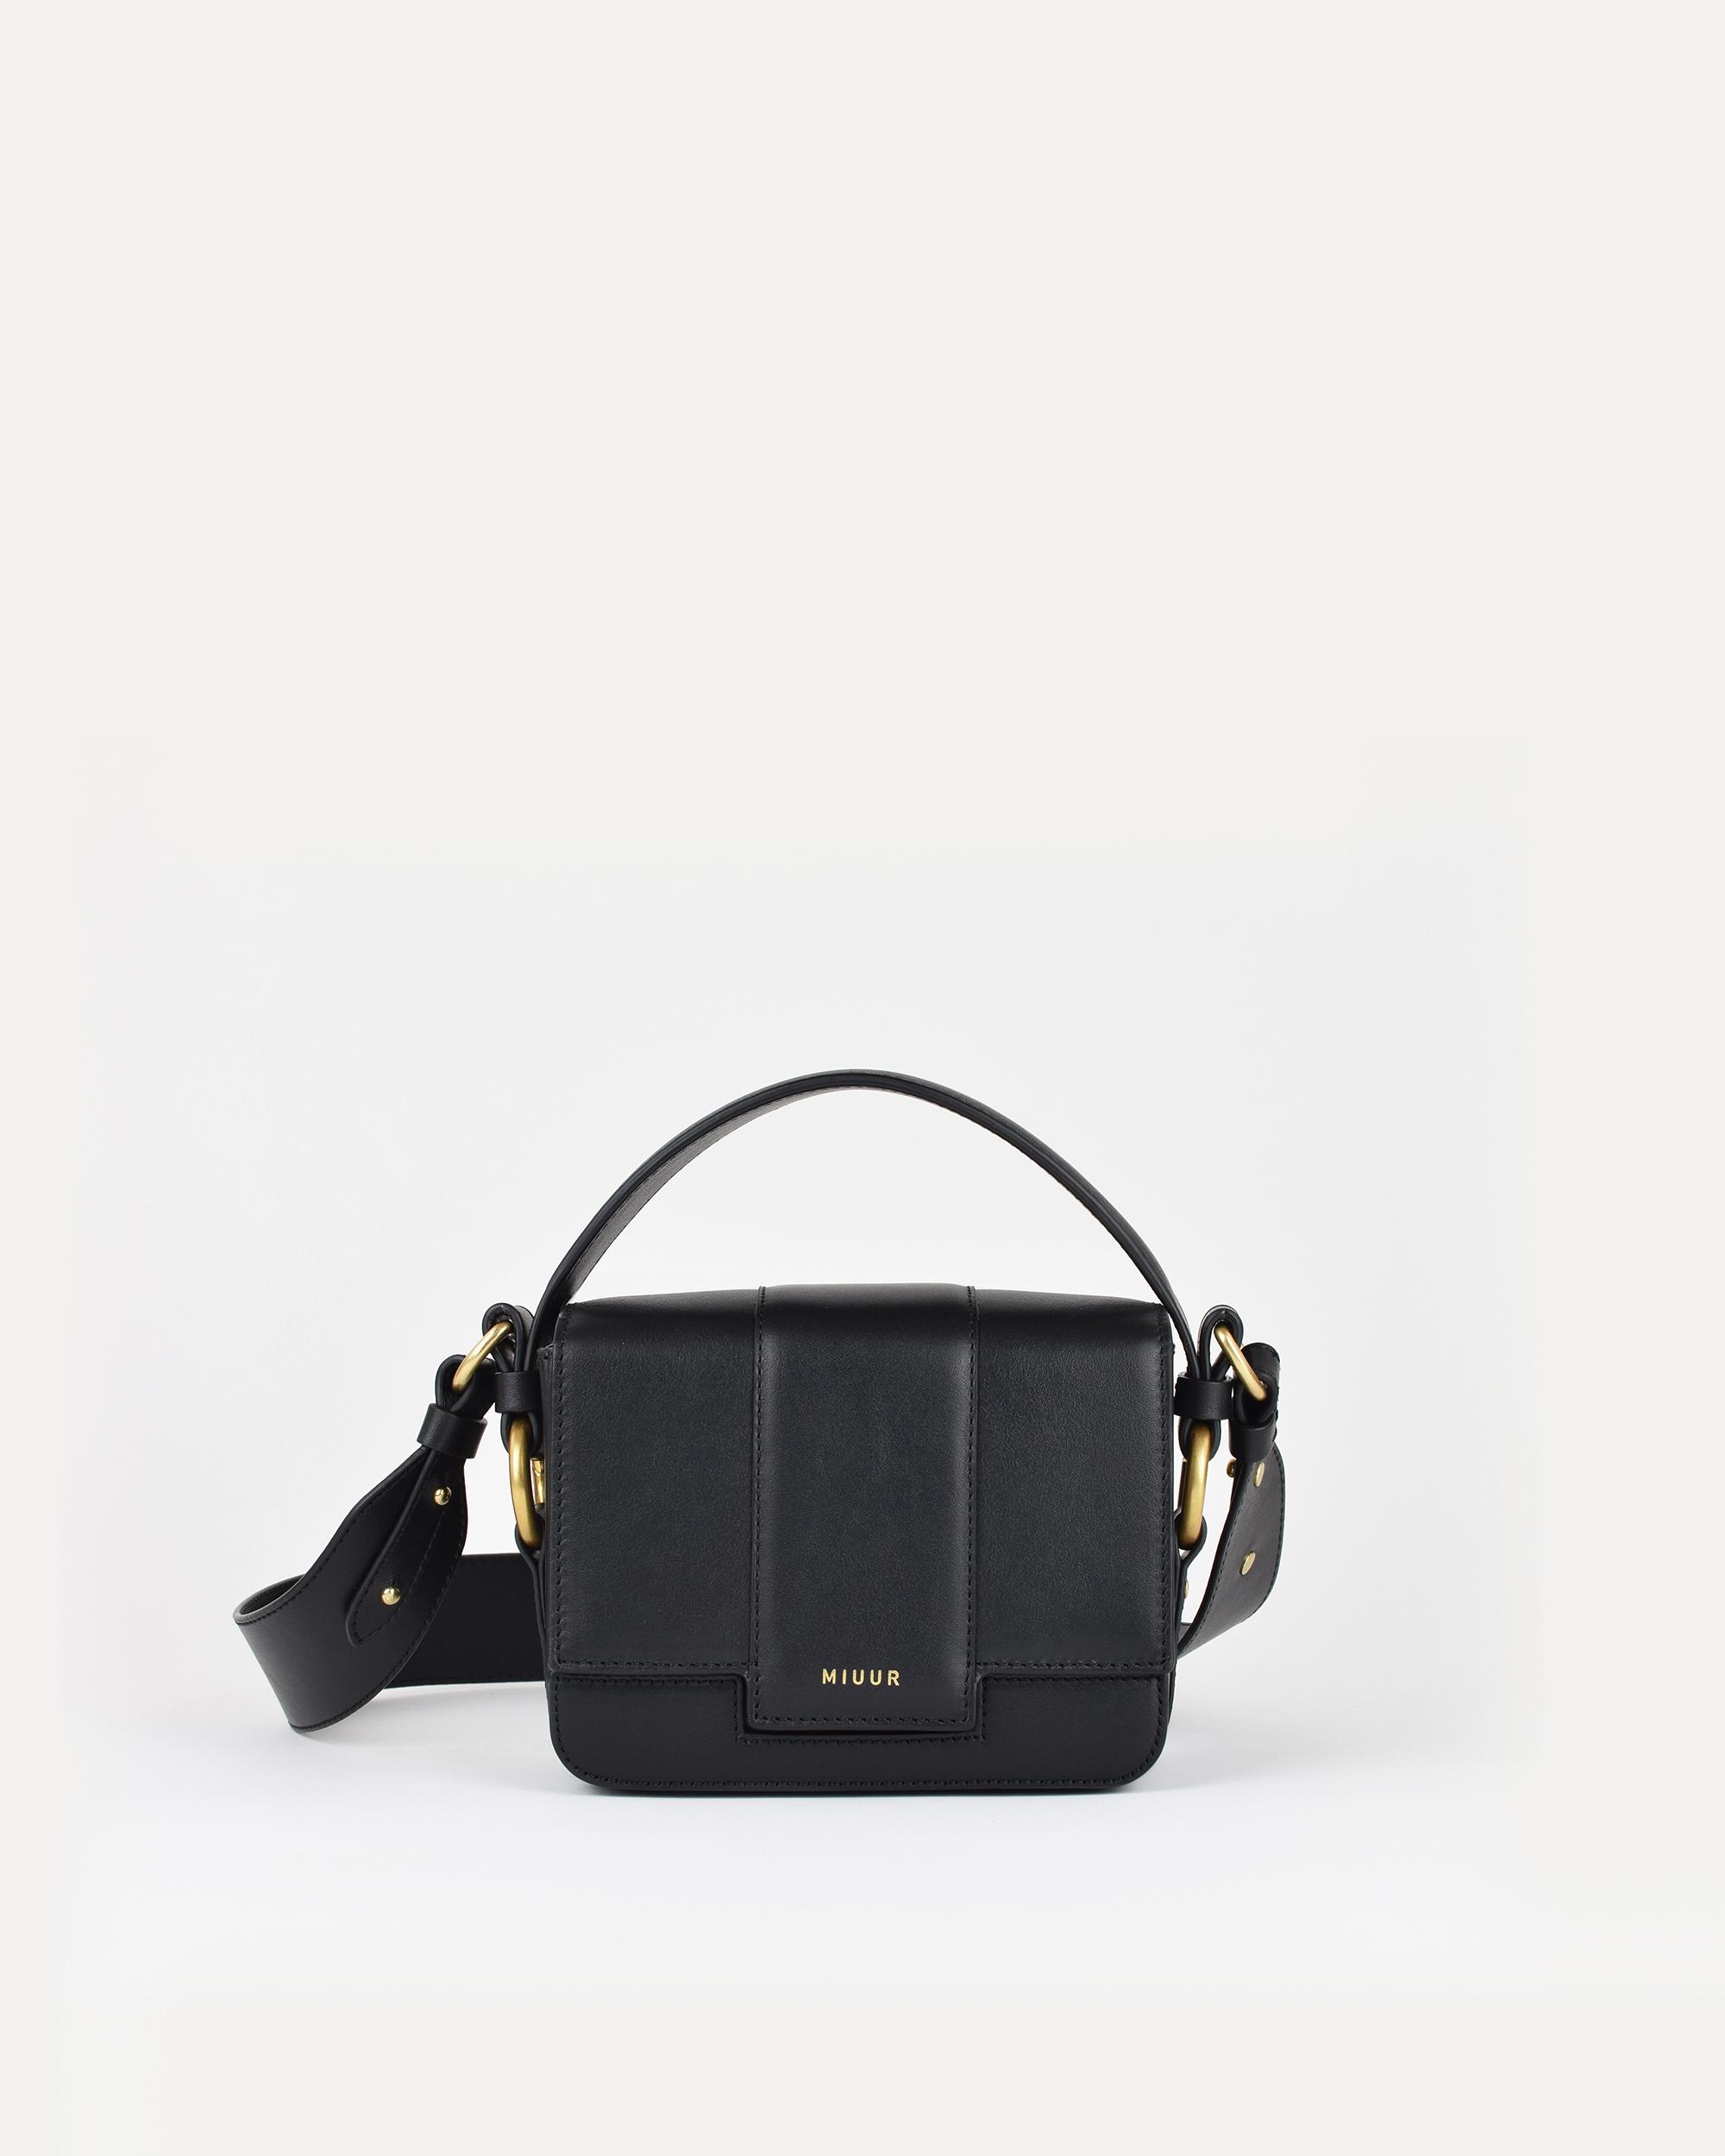 miuur m handbag black